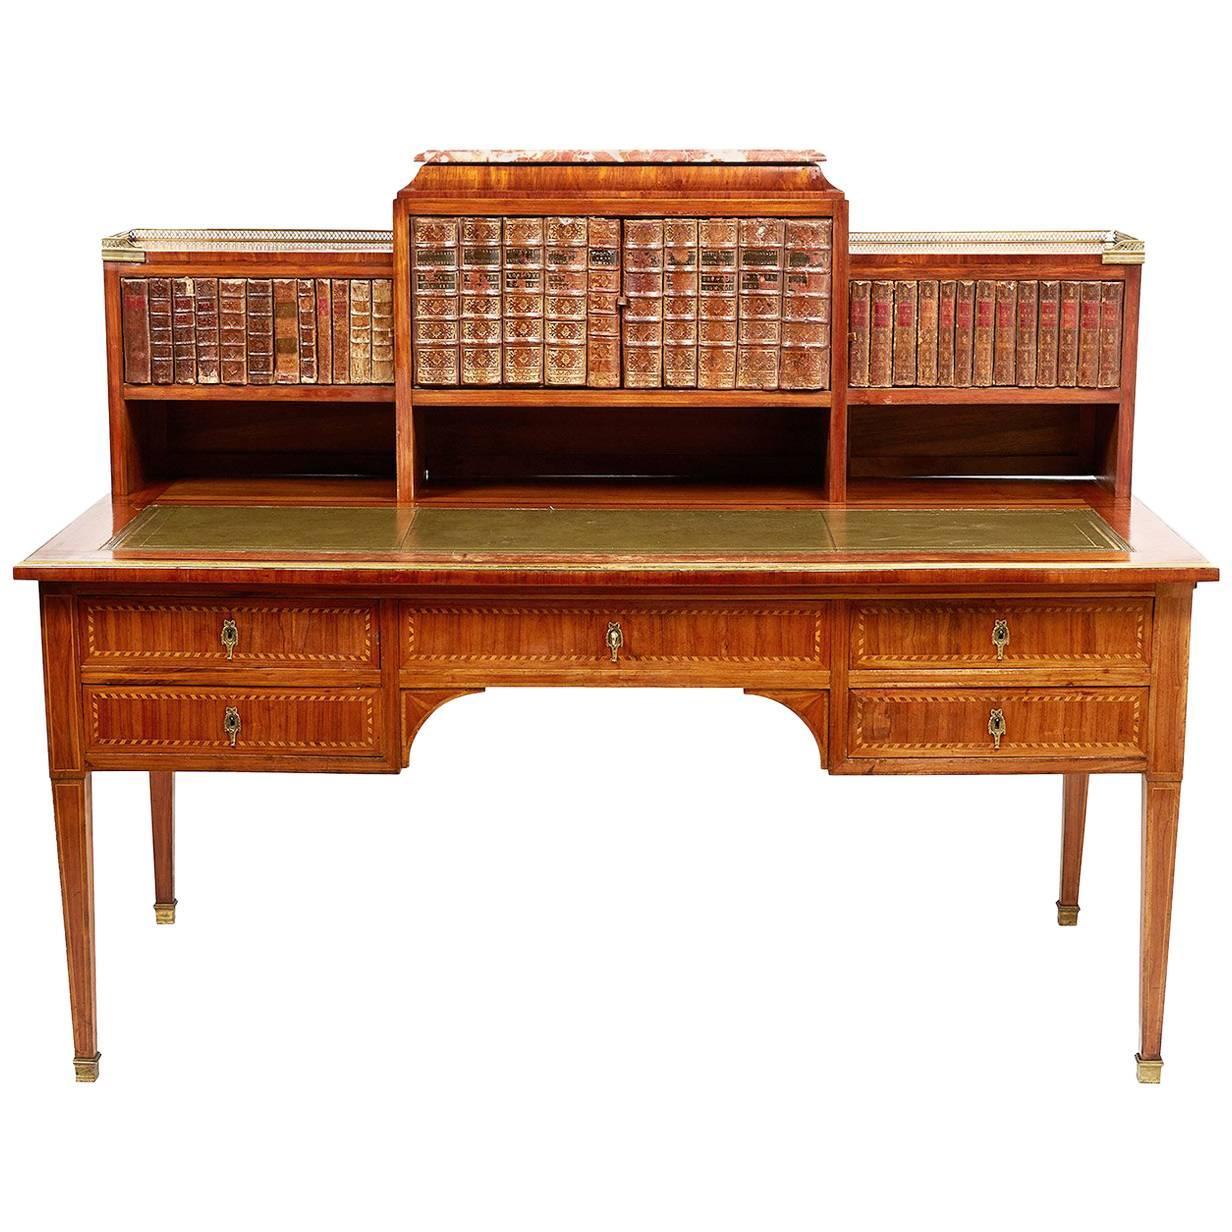 French Louis XVI Style Marquetry Desk, circa 1900